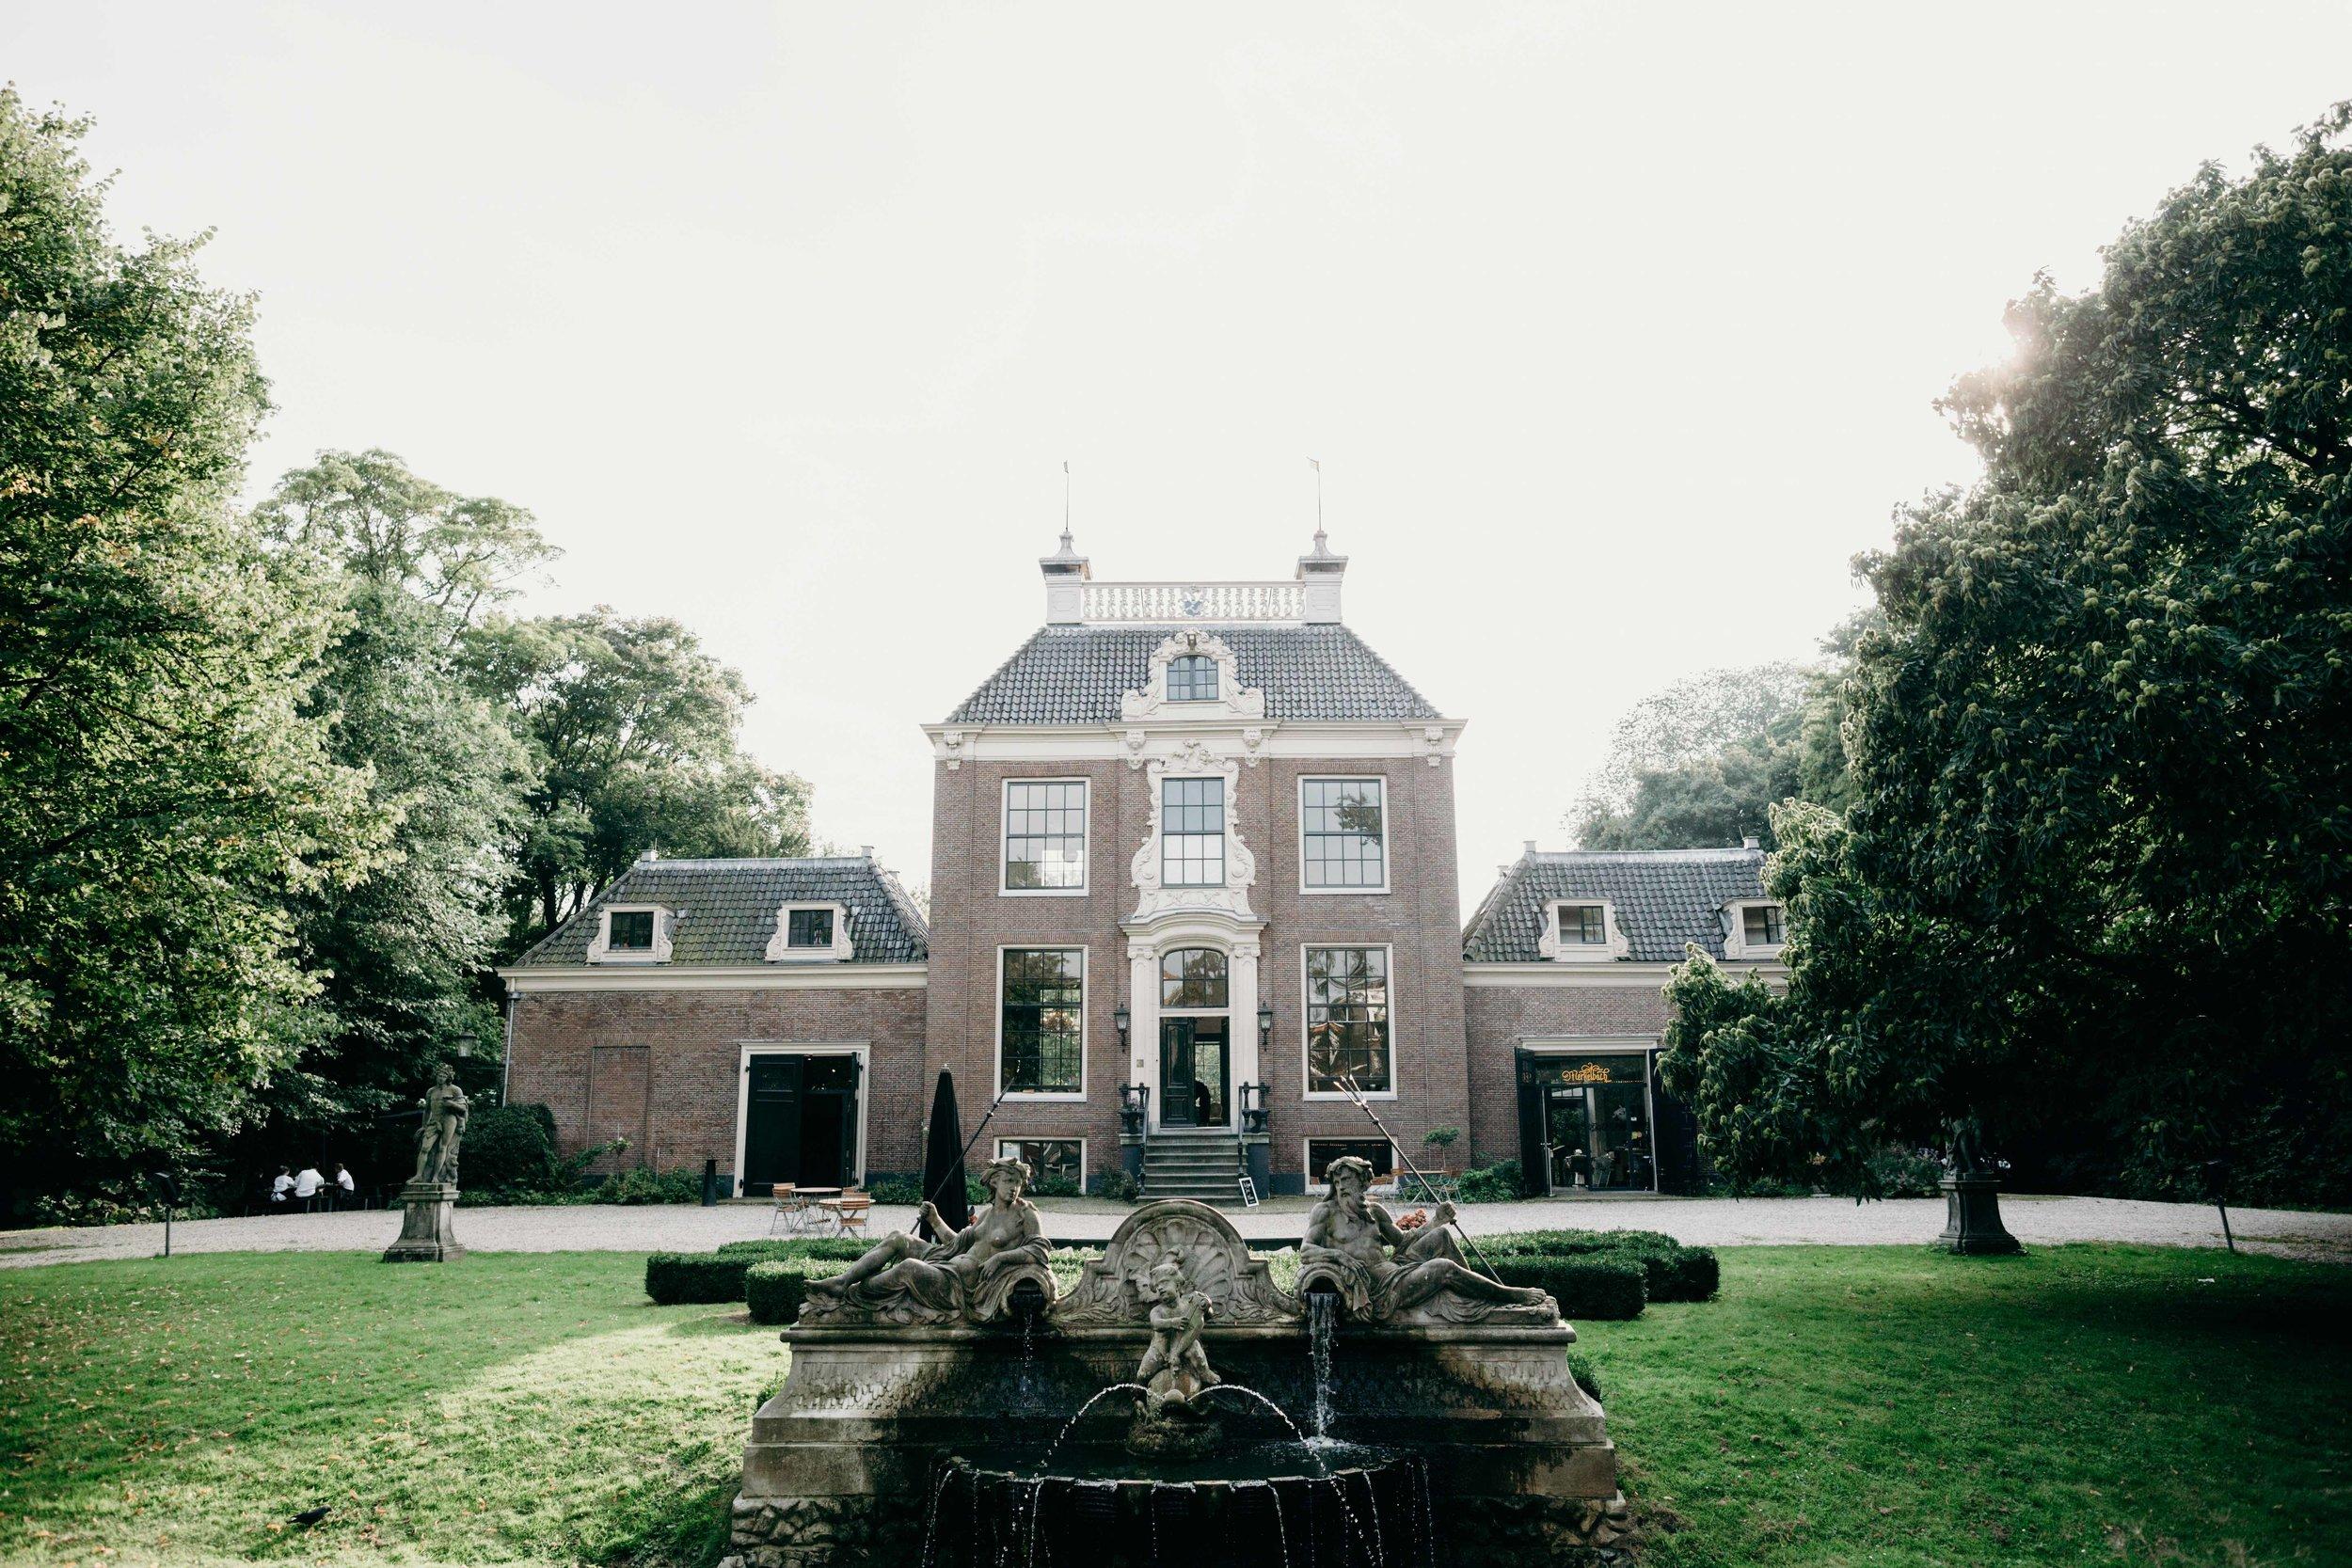 Huize Frankendael Amsterdam